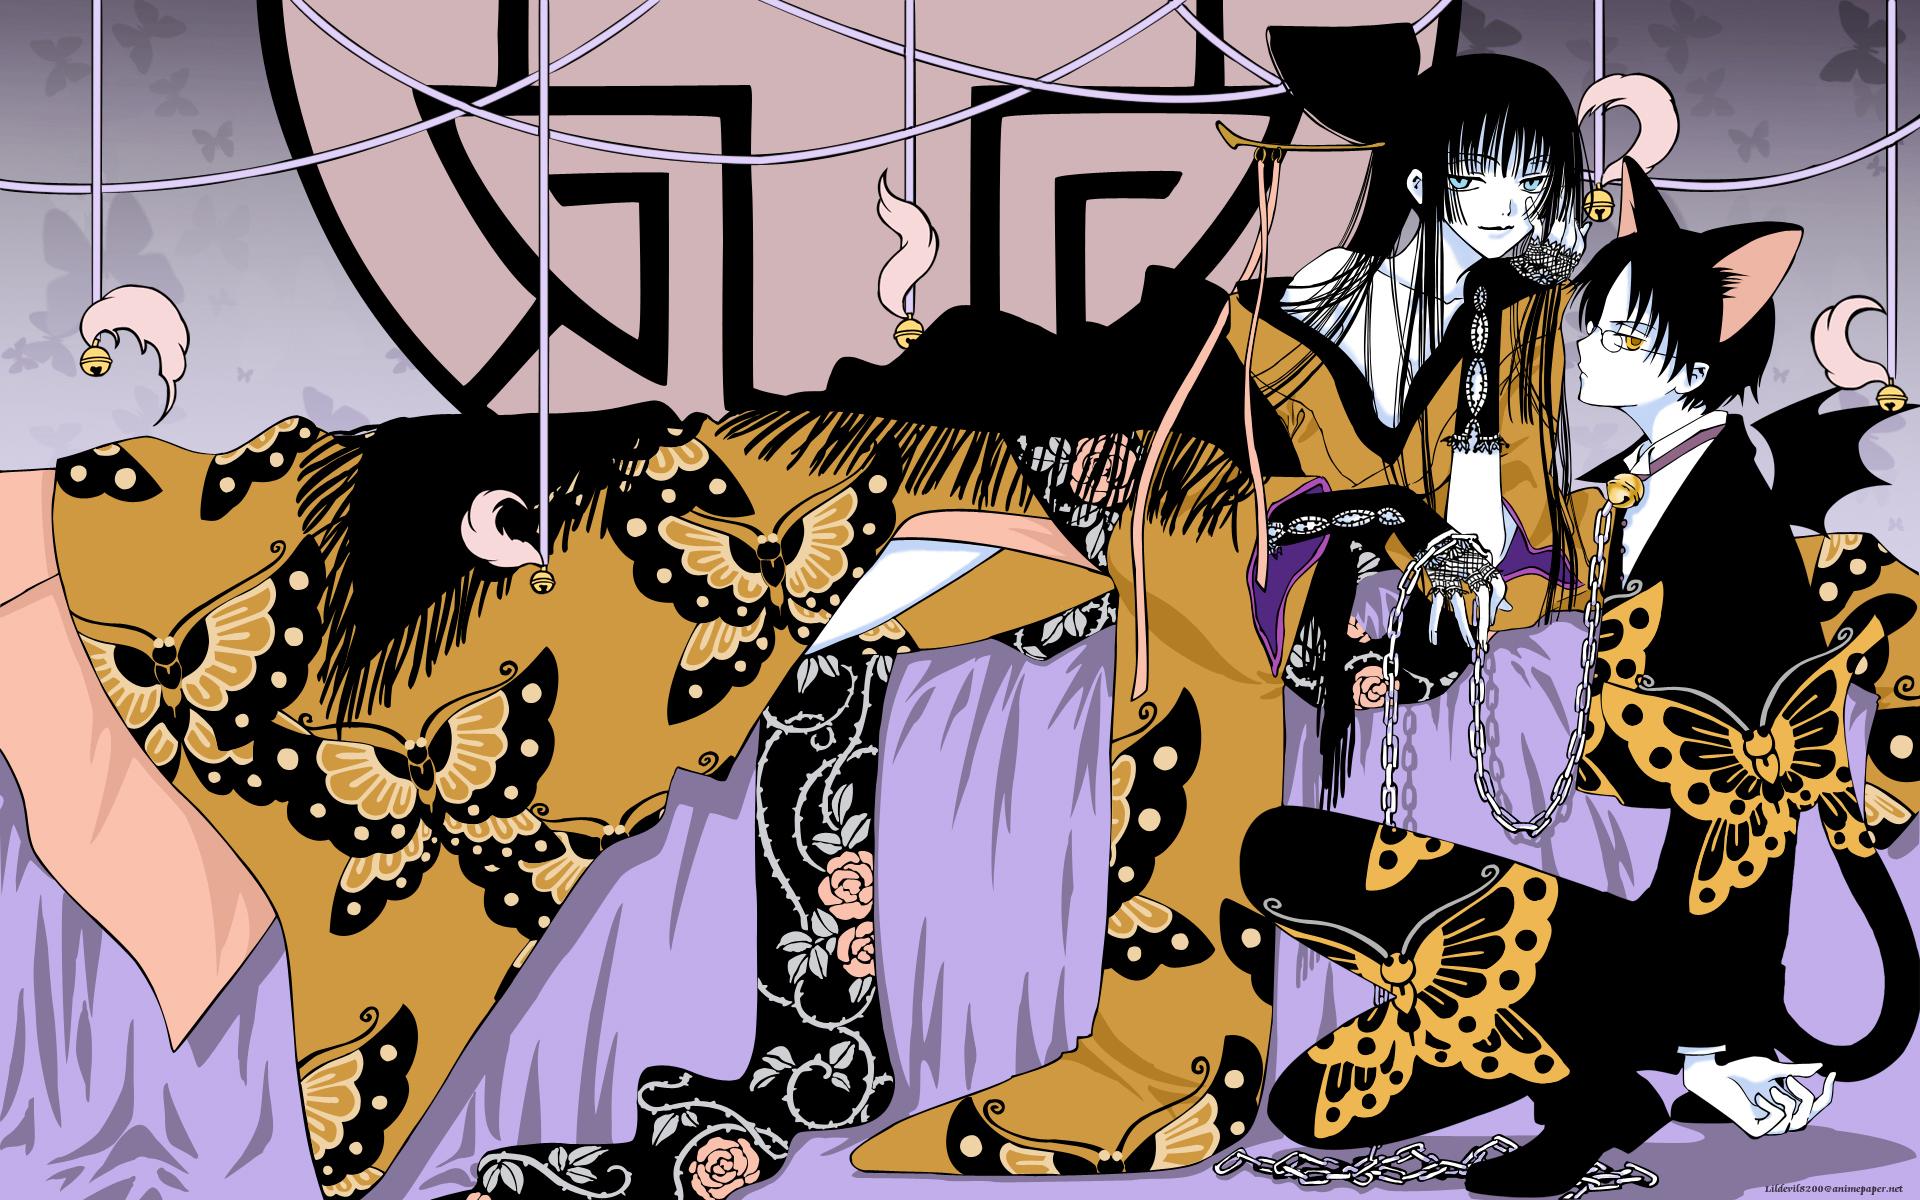 Imagez OnlyxxxHolic  Manga Anime  HD Wallpaper02Post navigation